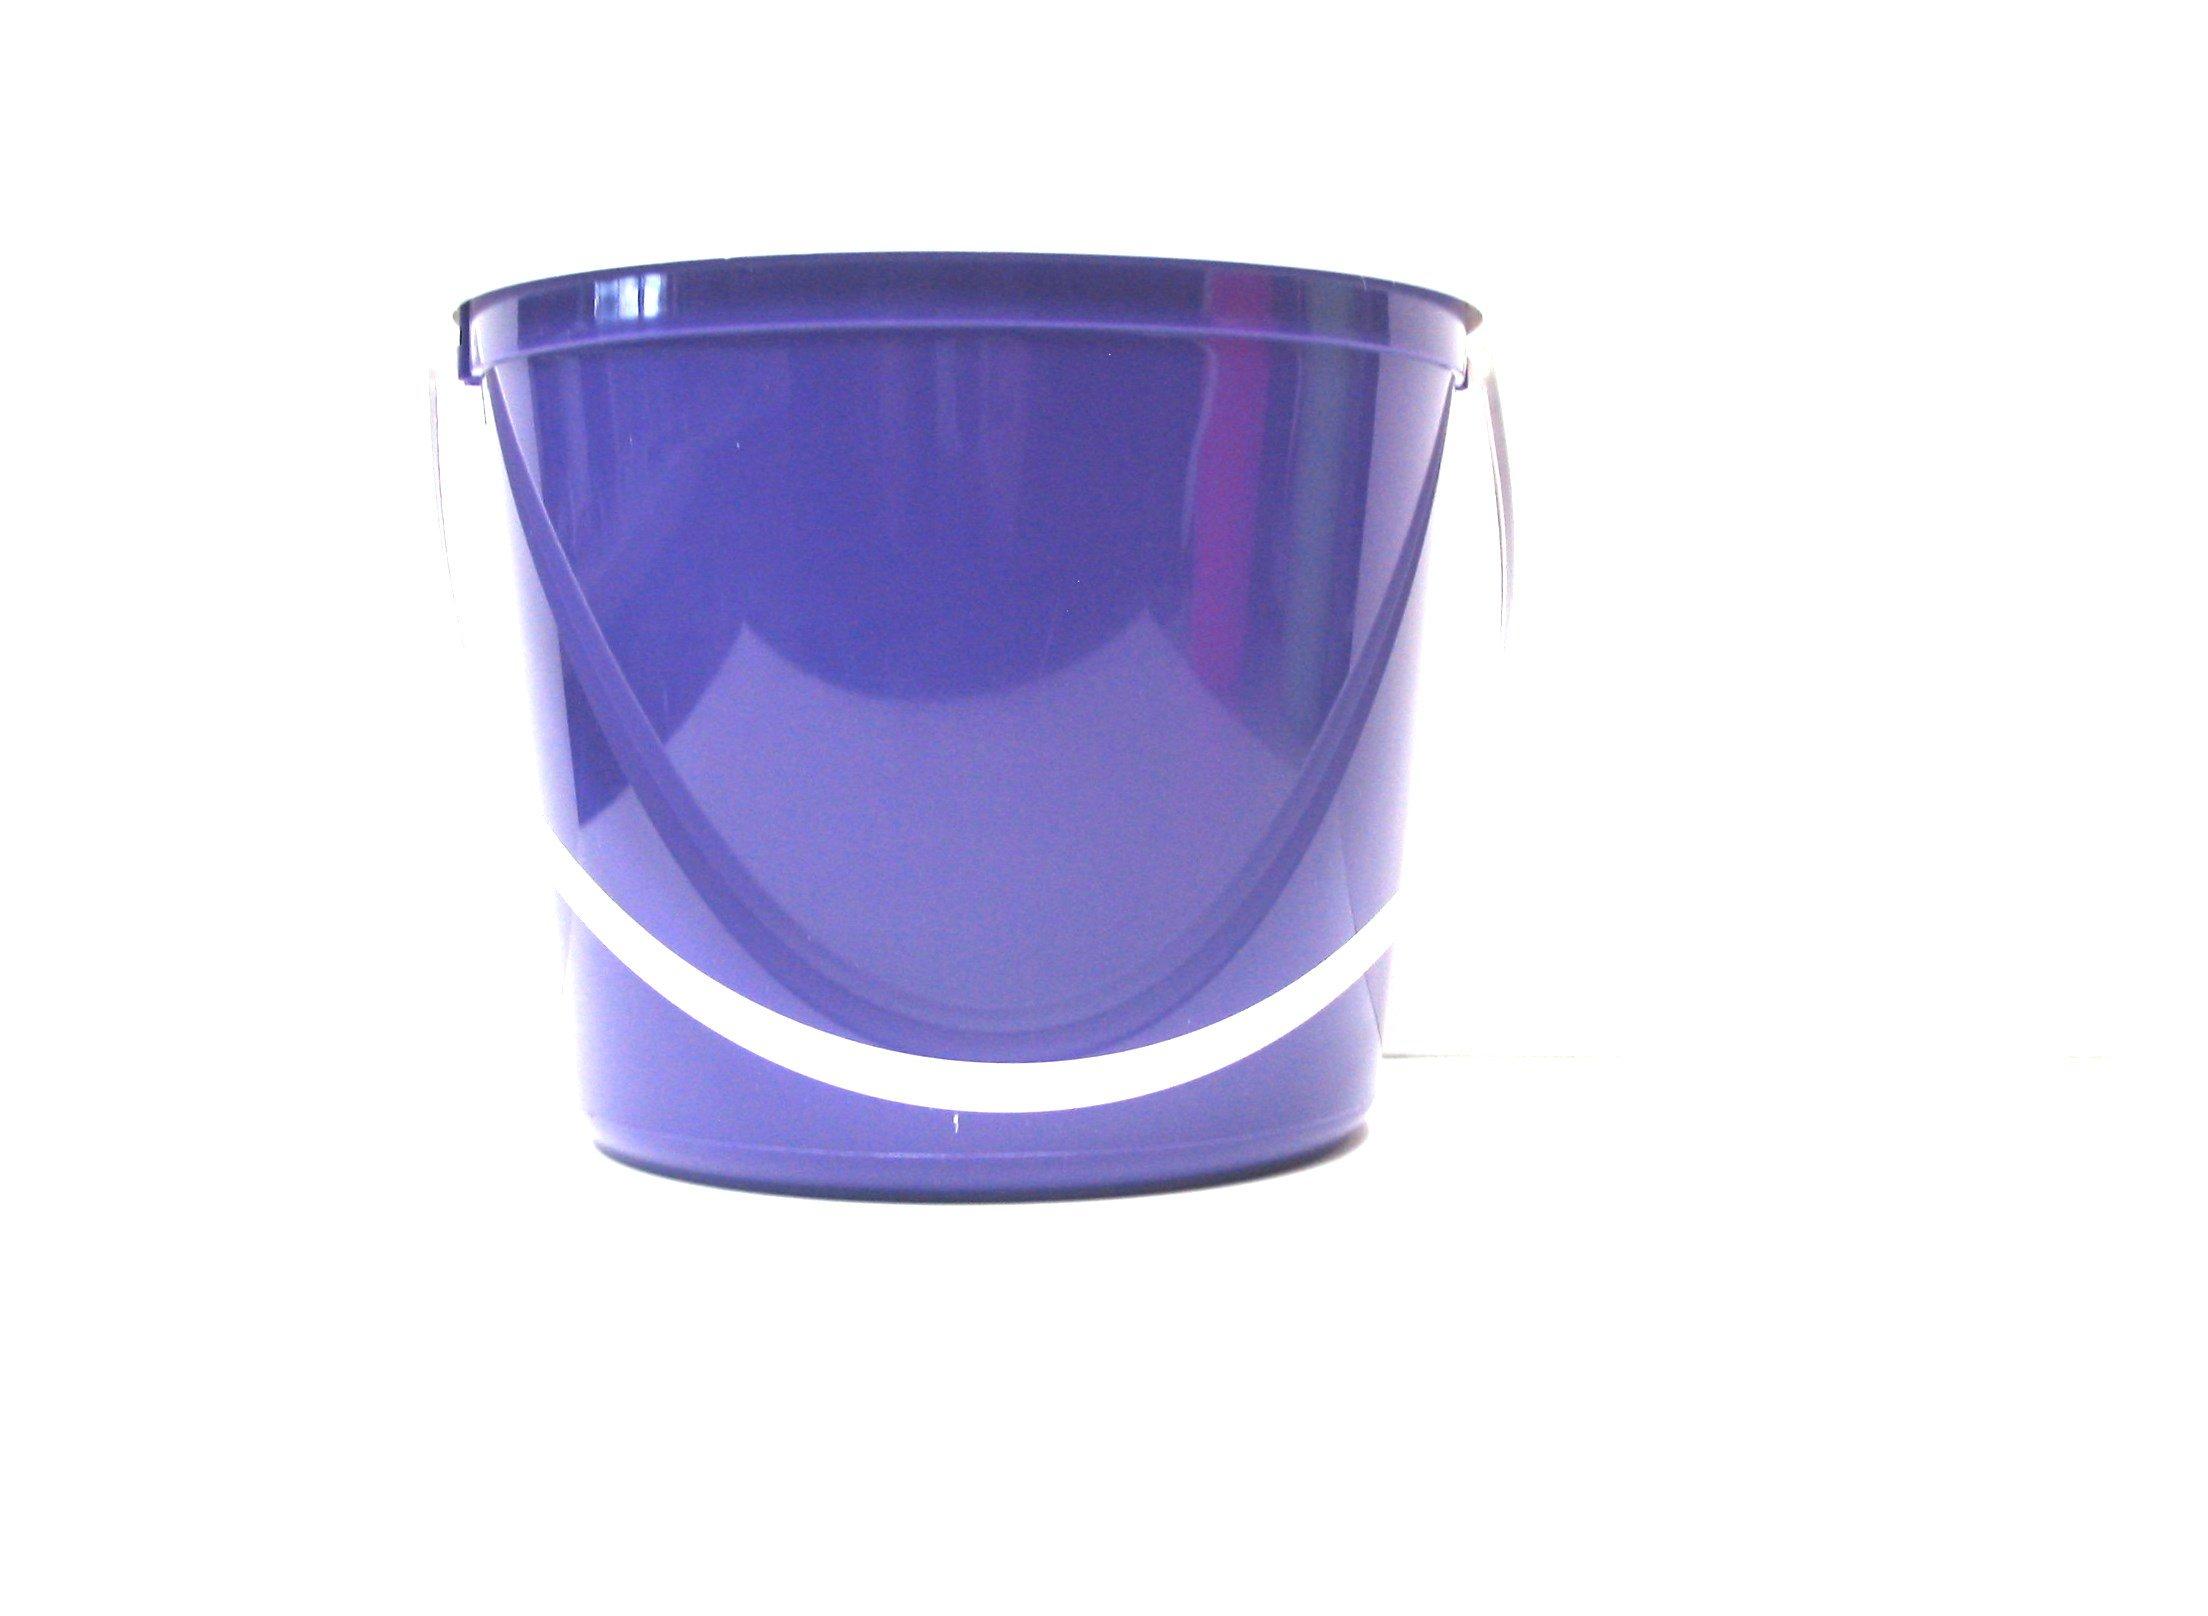 Talisman, Plastic Buckets & Lids, 80 Ounces, 3 Pack, Purple by Talisman (Image #2)